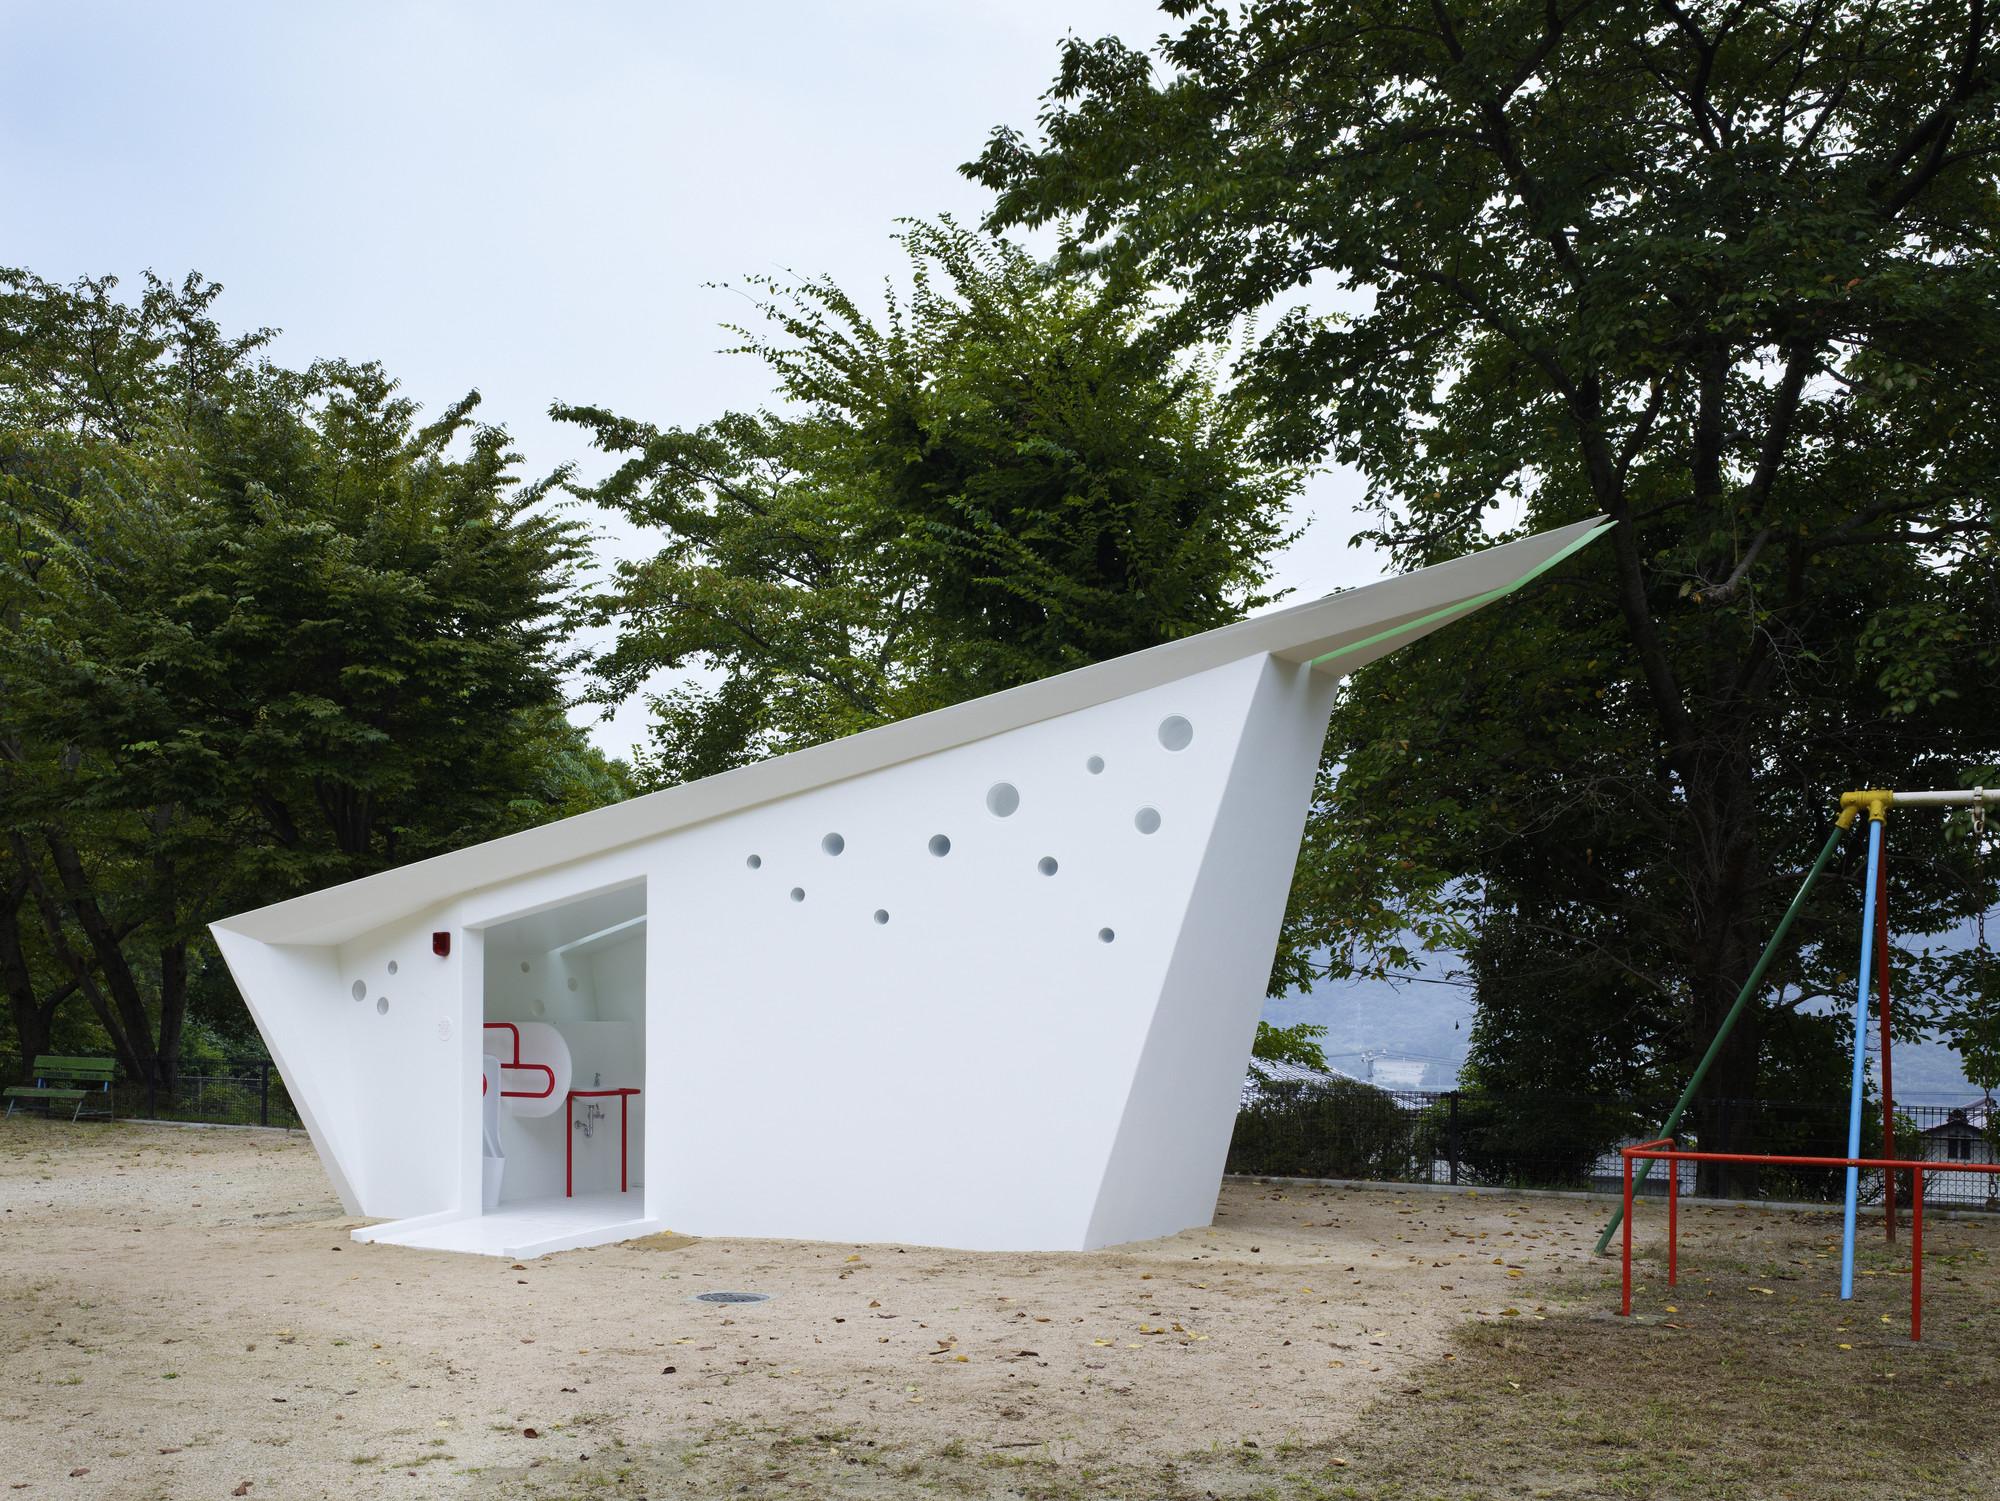 Hiroshima Park Restrooms: Absolute Arrows / Future Studio, © Toshiyuki Yano